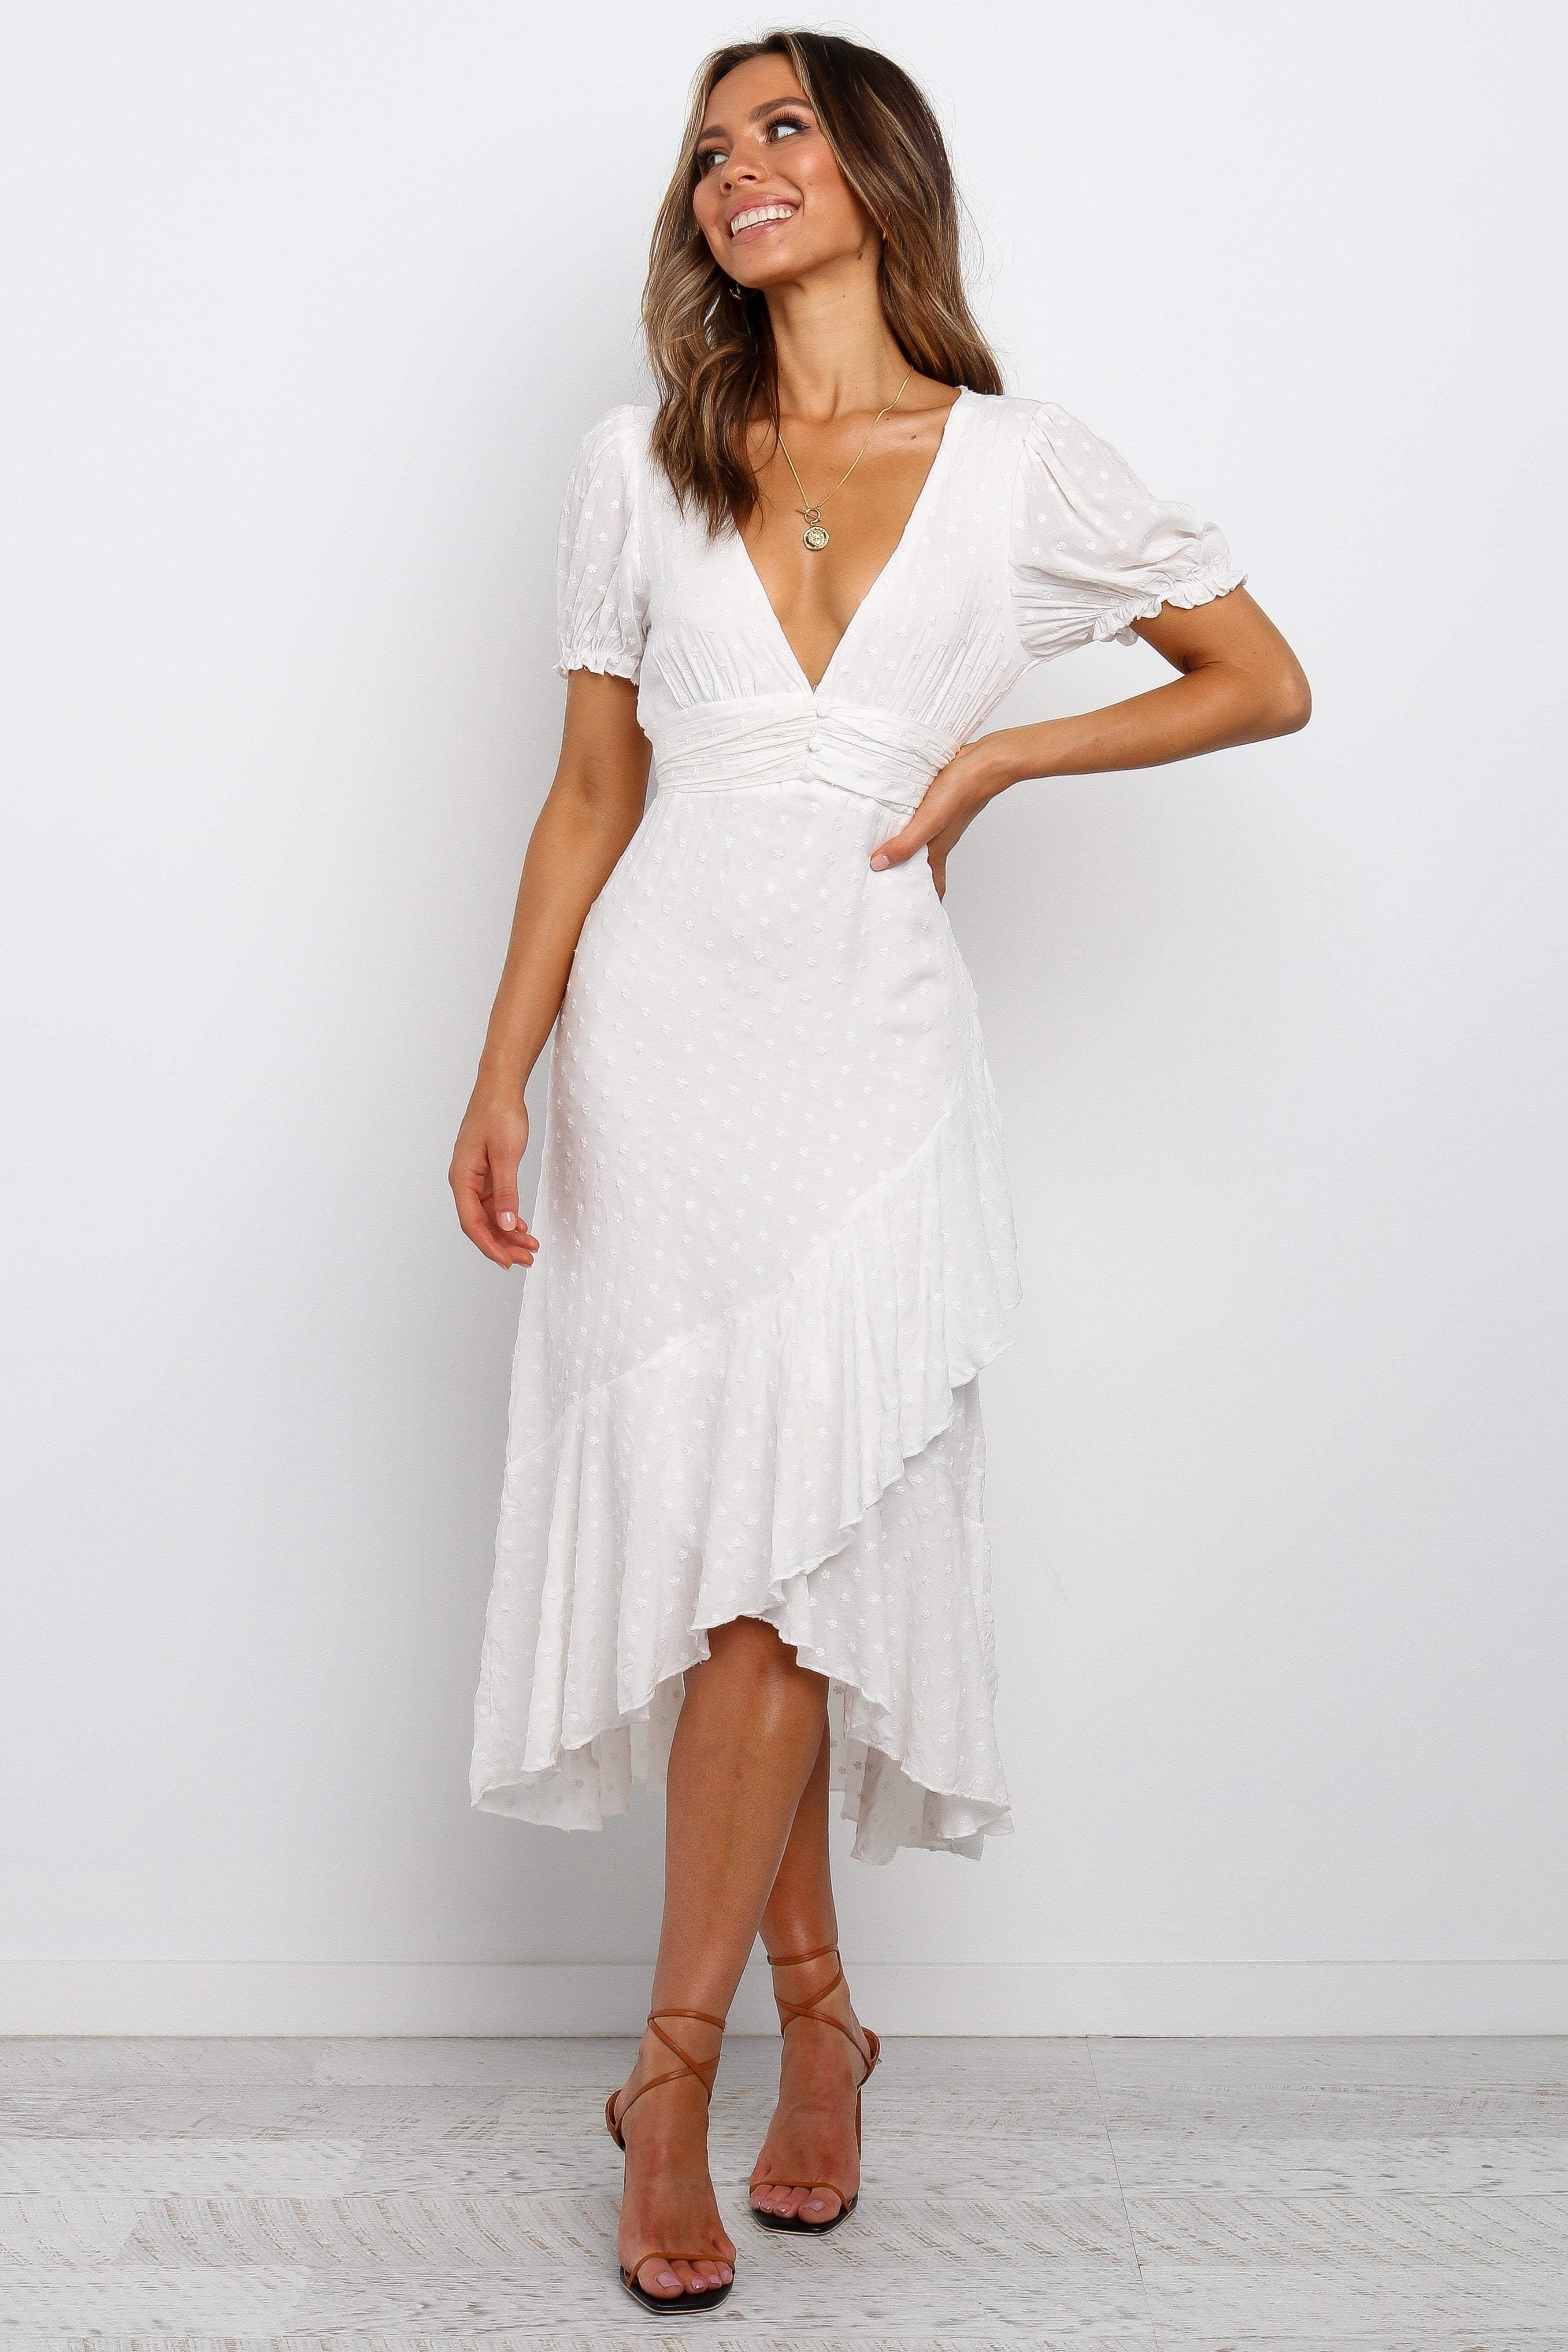 Pin By Chloe Ridler On Fashion In 2021 White Short Sleeve Dress Dresses White Dress [ 5338 x 3559 Pixel ]